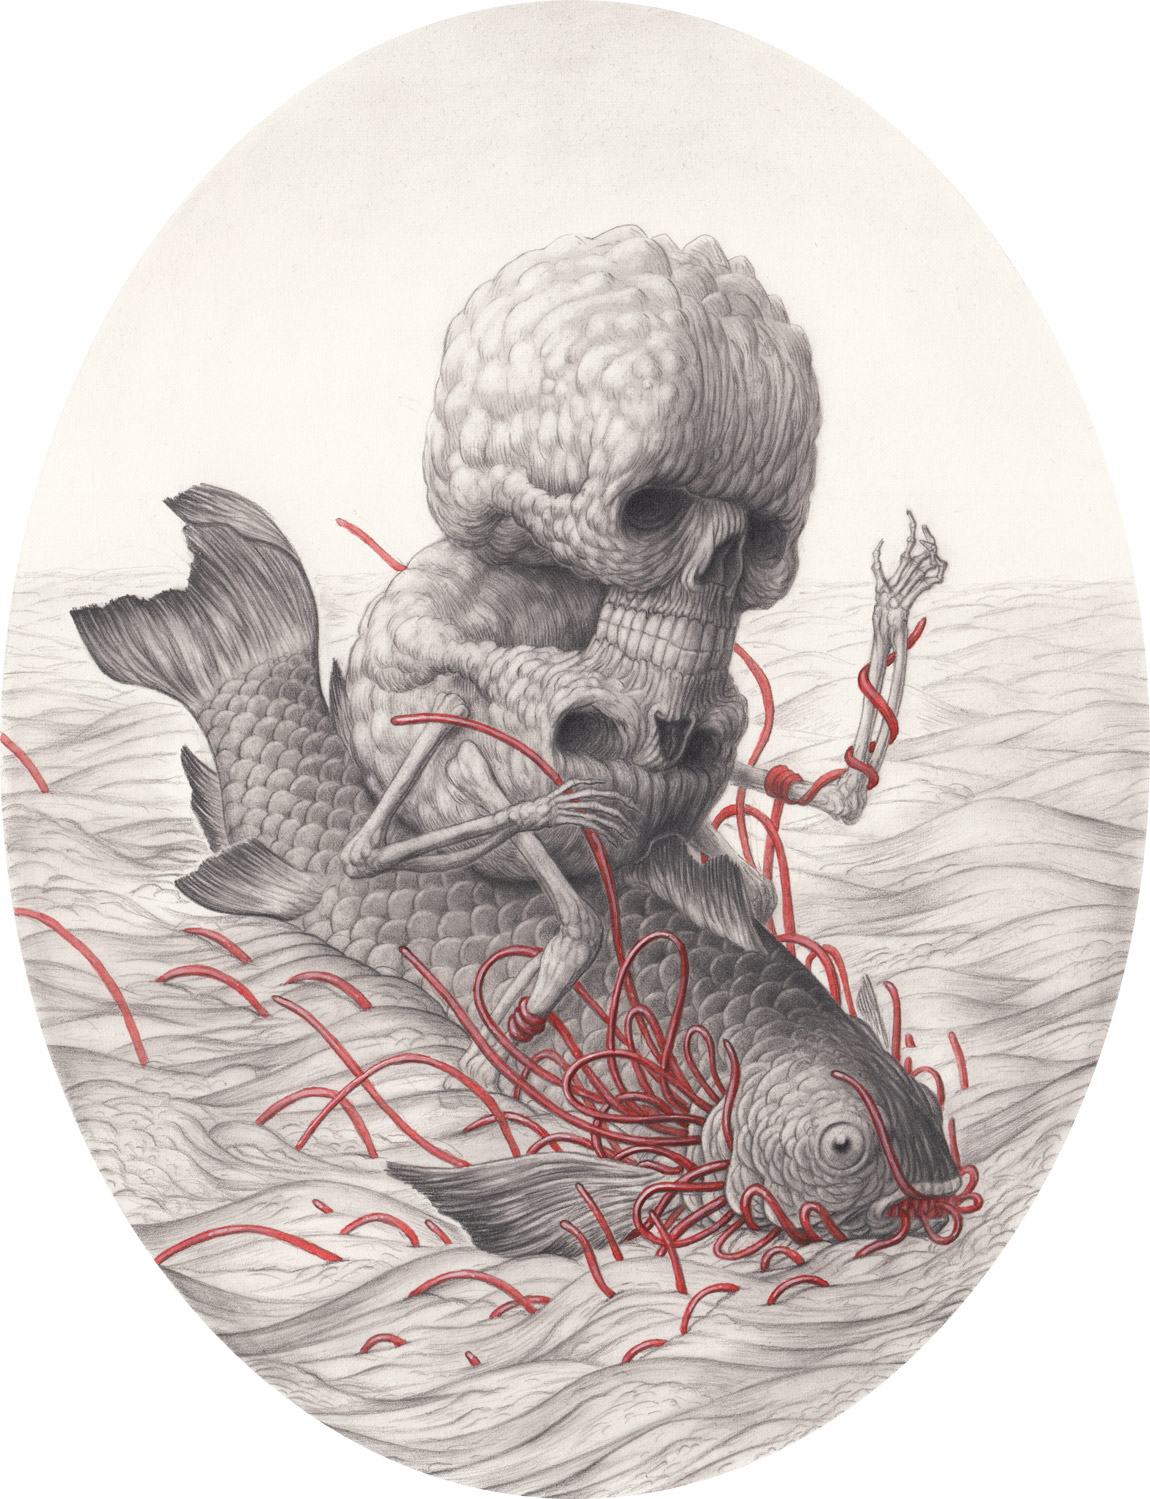 Fish 1 By Nick Sheehy